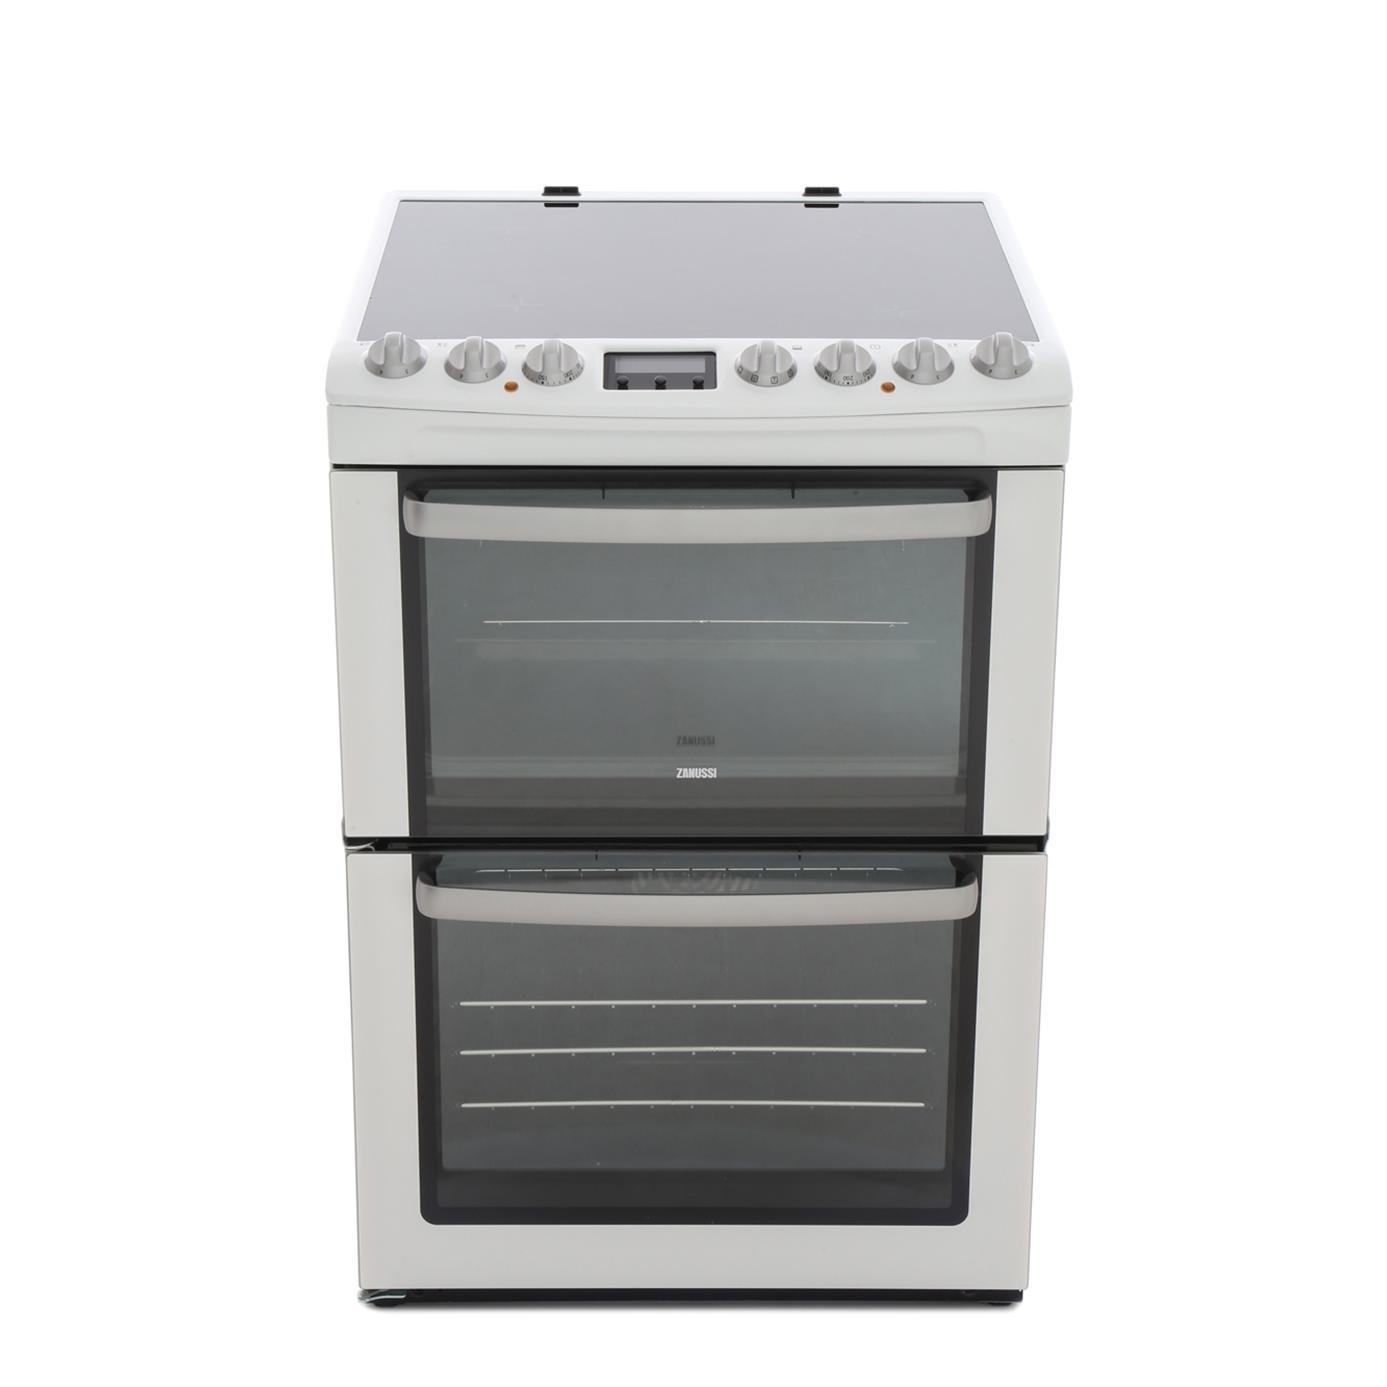 Zanussi ZCV66AEWC Ceramic Electric Cooker with Double Oven